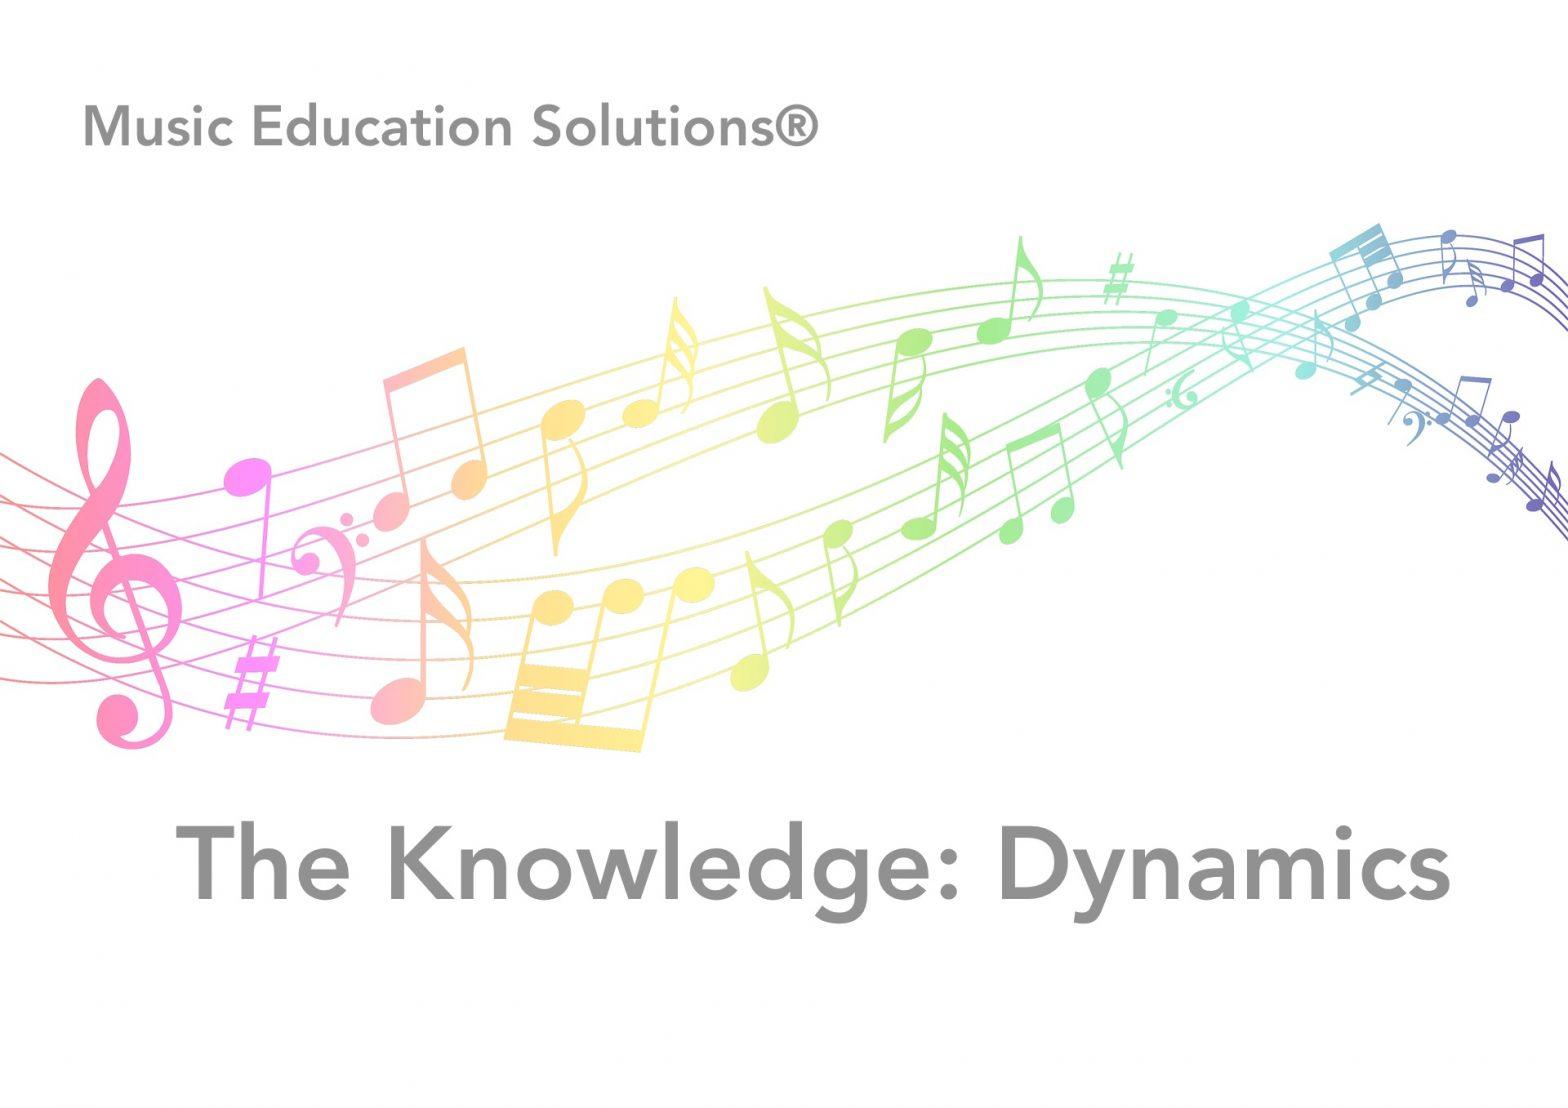 The Knowledge: Dynamics Vocabulary